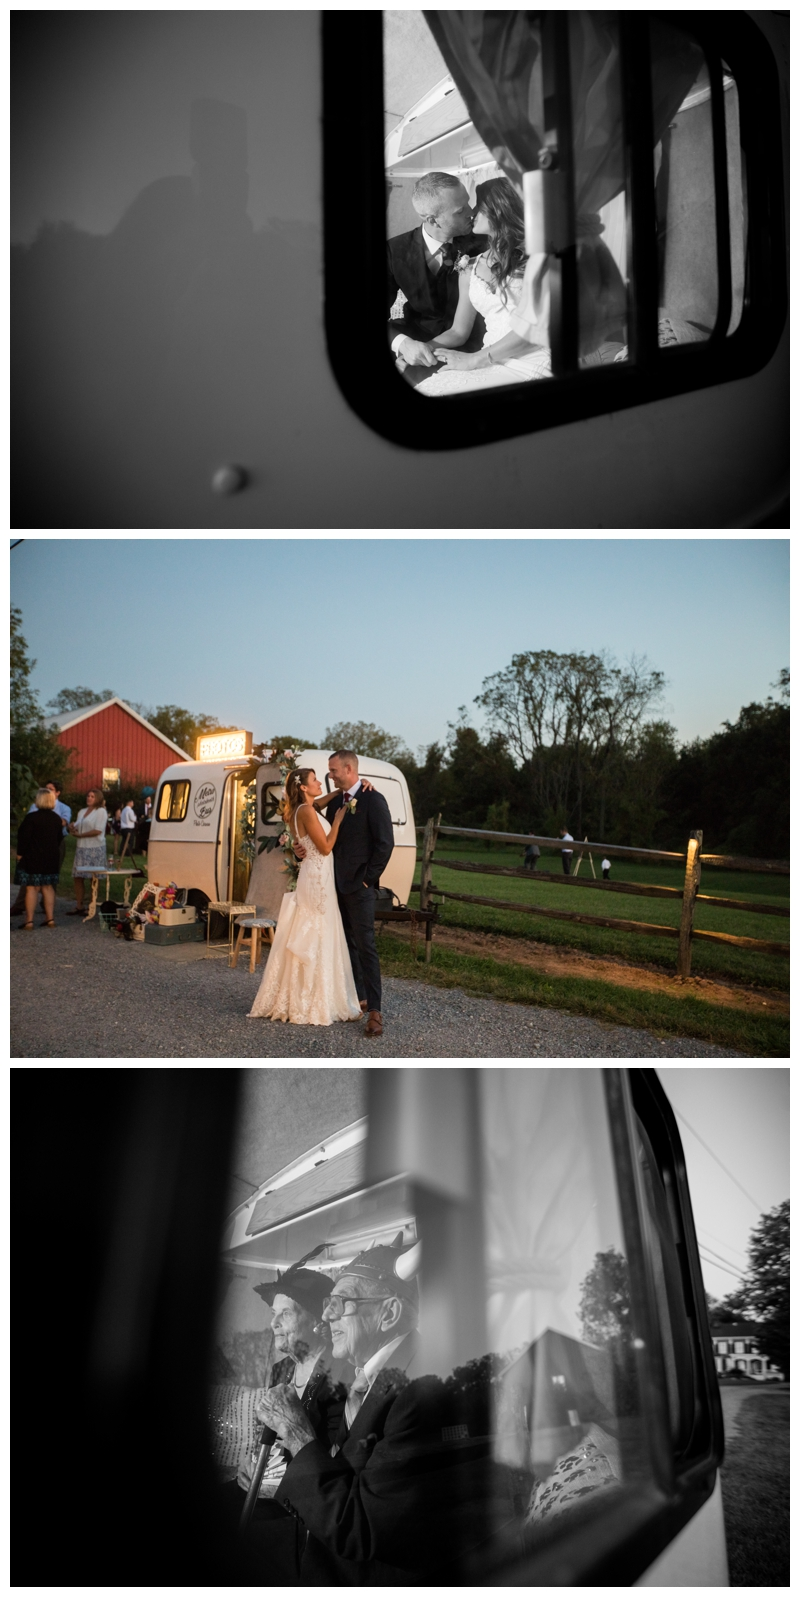 unionville-vineyards-wedding-styled-pink-photography-37.jpg